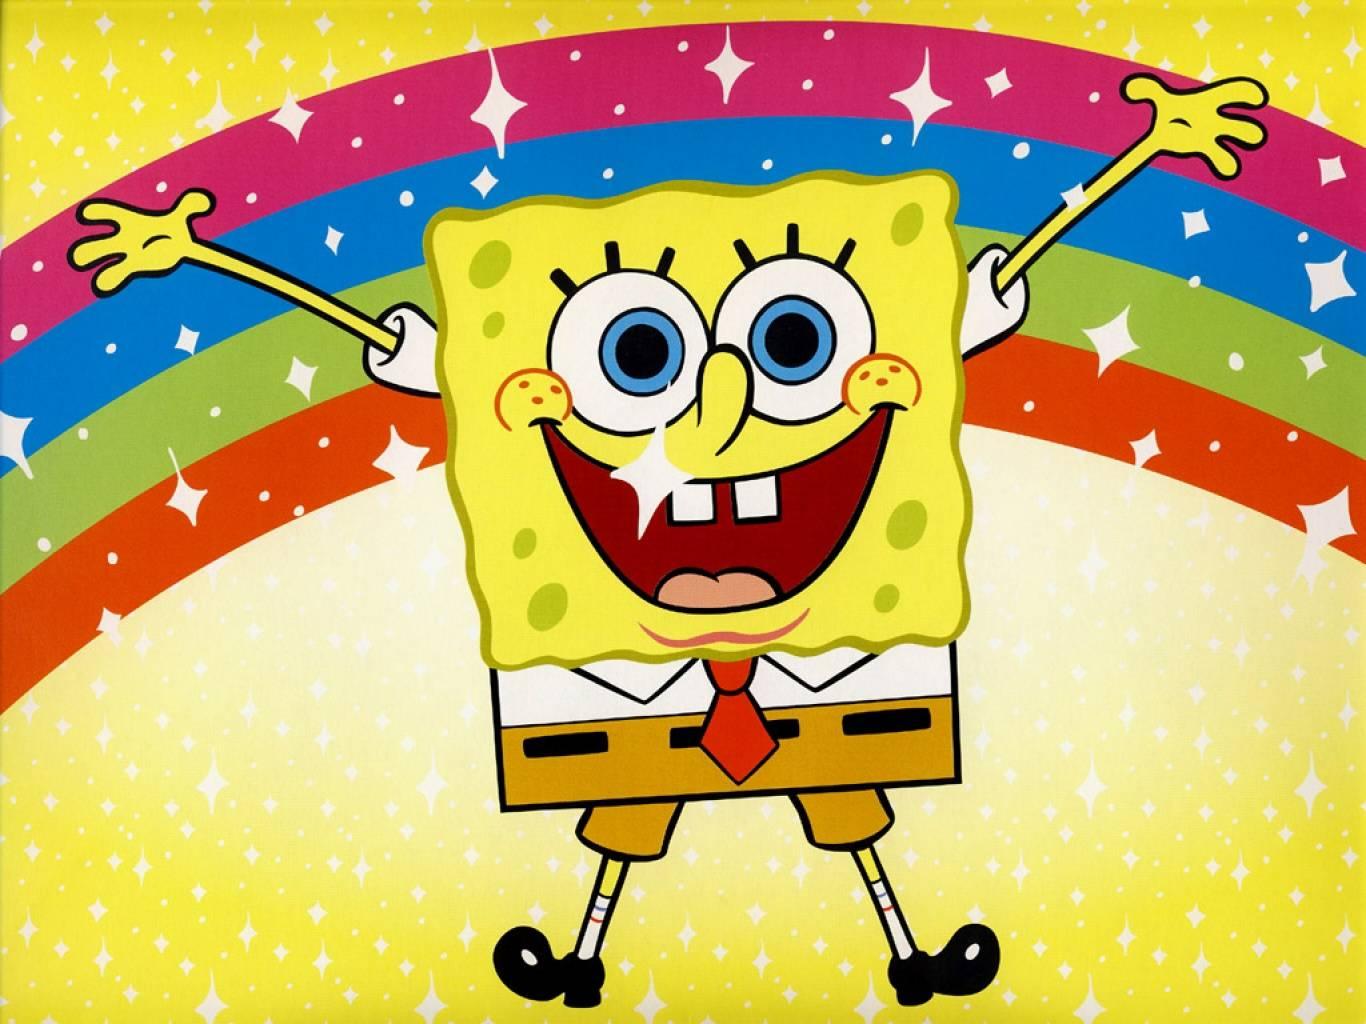 Gambar Foto Kartun Spongebob Lucu Gambar Kata Kata